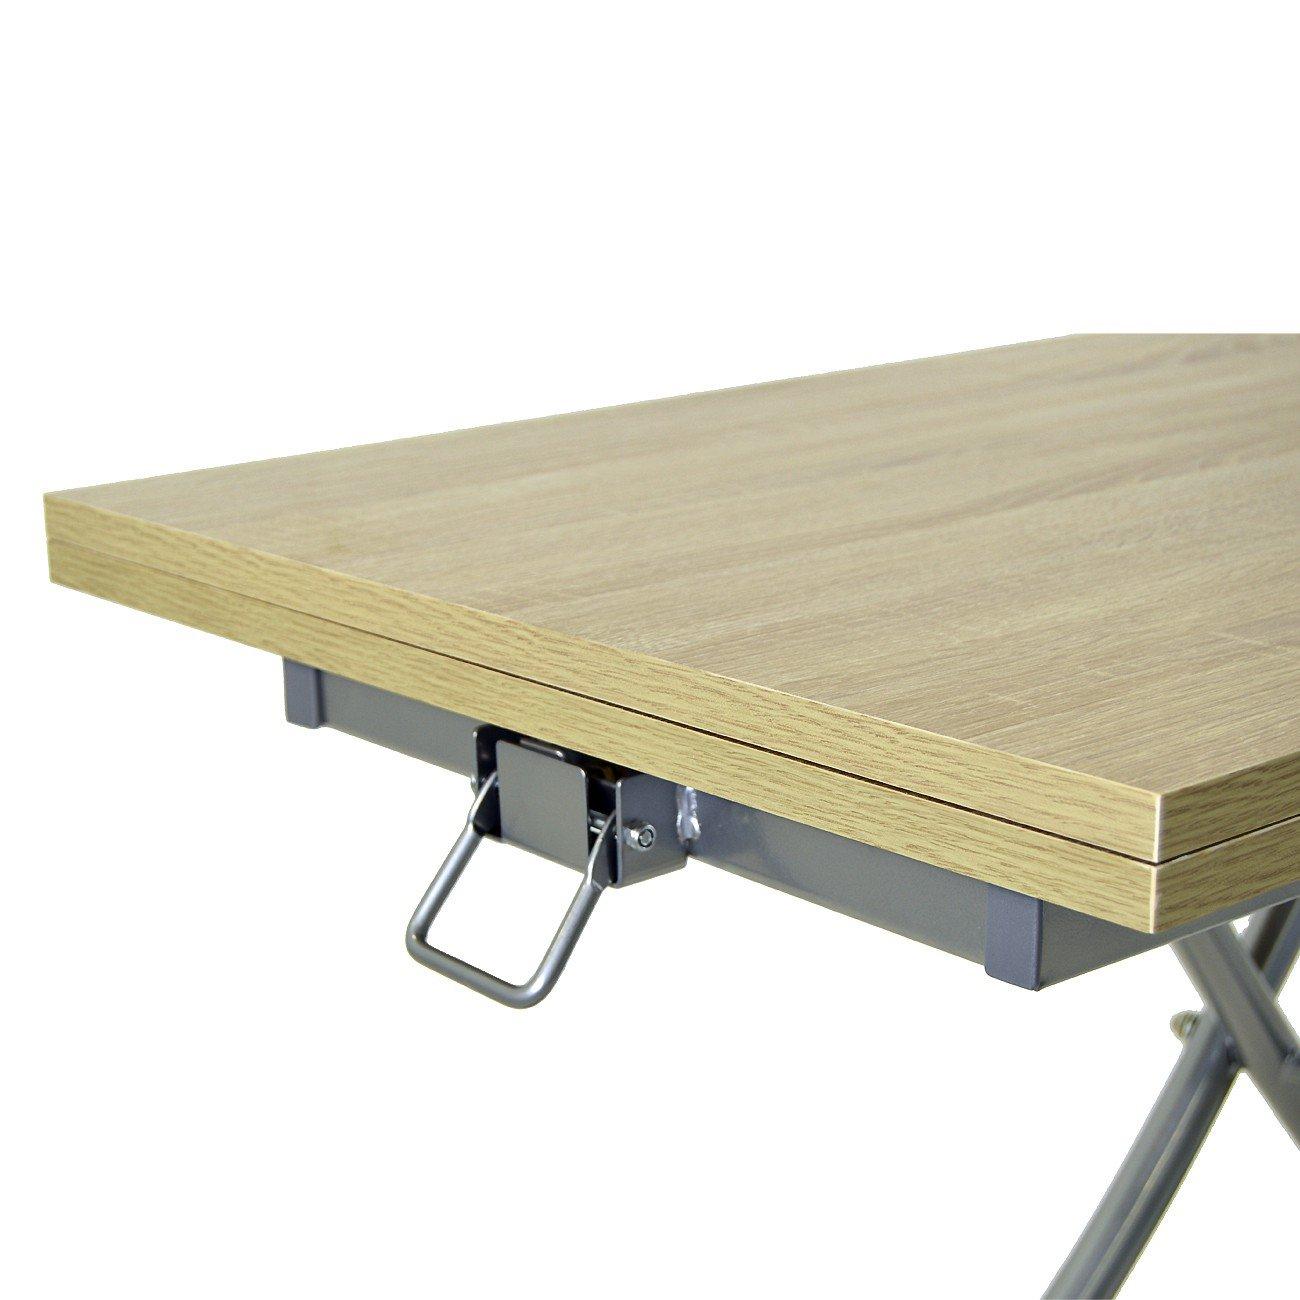 wundersch nen table basse menzzo id es de conception de table basse. Black Bedroom Furniture Sets. Home Design Ideas